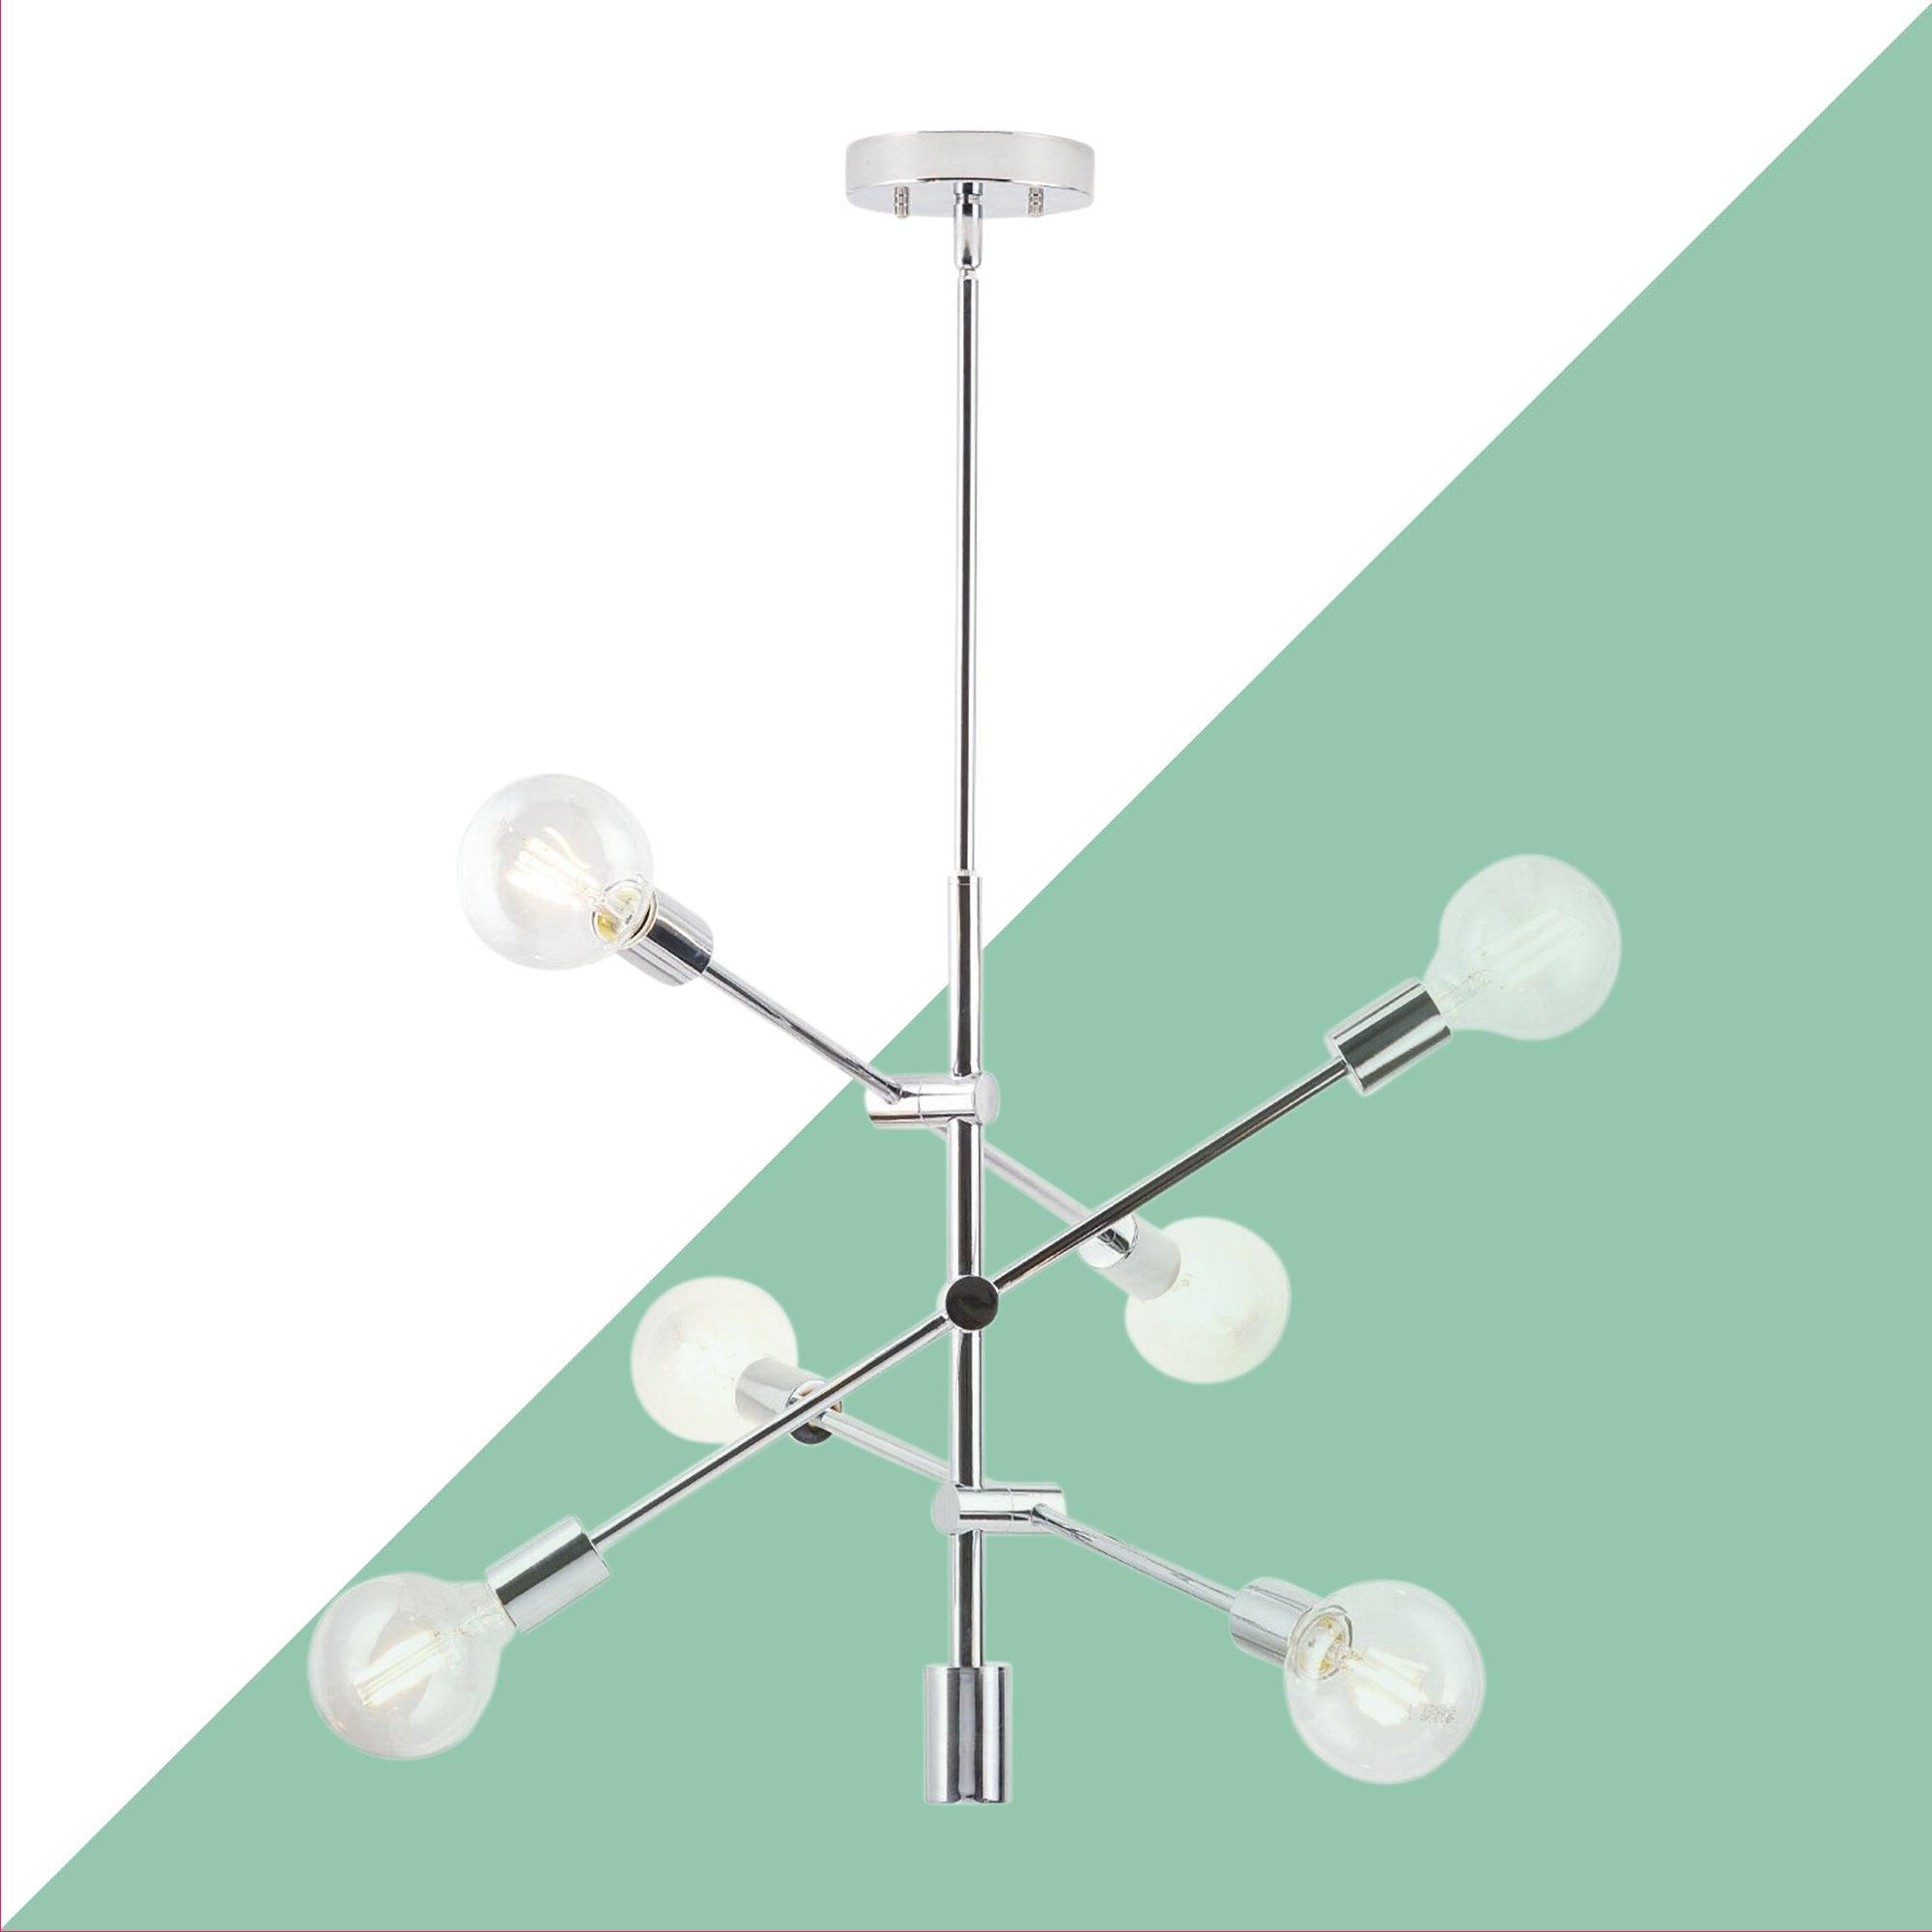 Eladia 6 Light Sputnik Chandelier Pertaining To Most Recently Released Eladia 6 Light Sputnik Chandeliers (View 7 of 20)